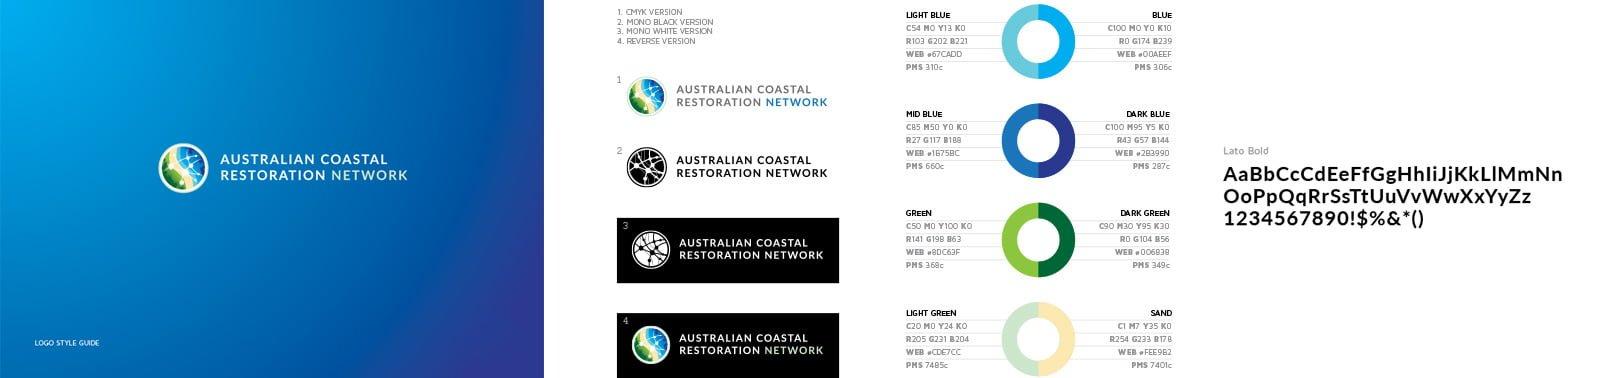 Brand Guidelines by Zephyrmedia